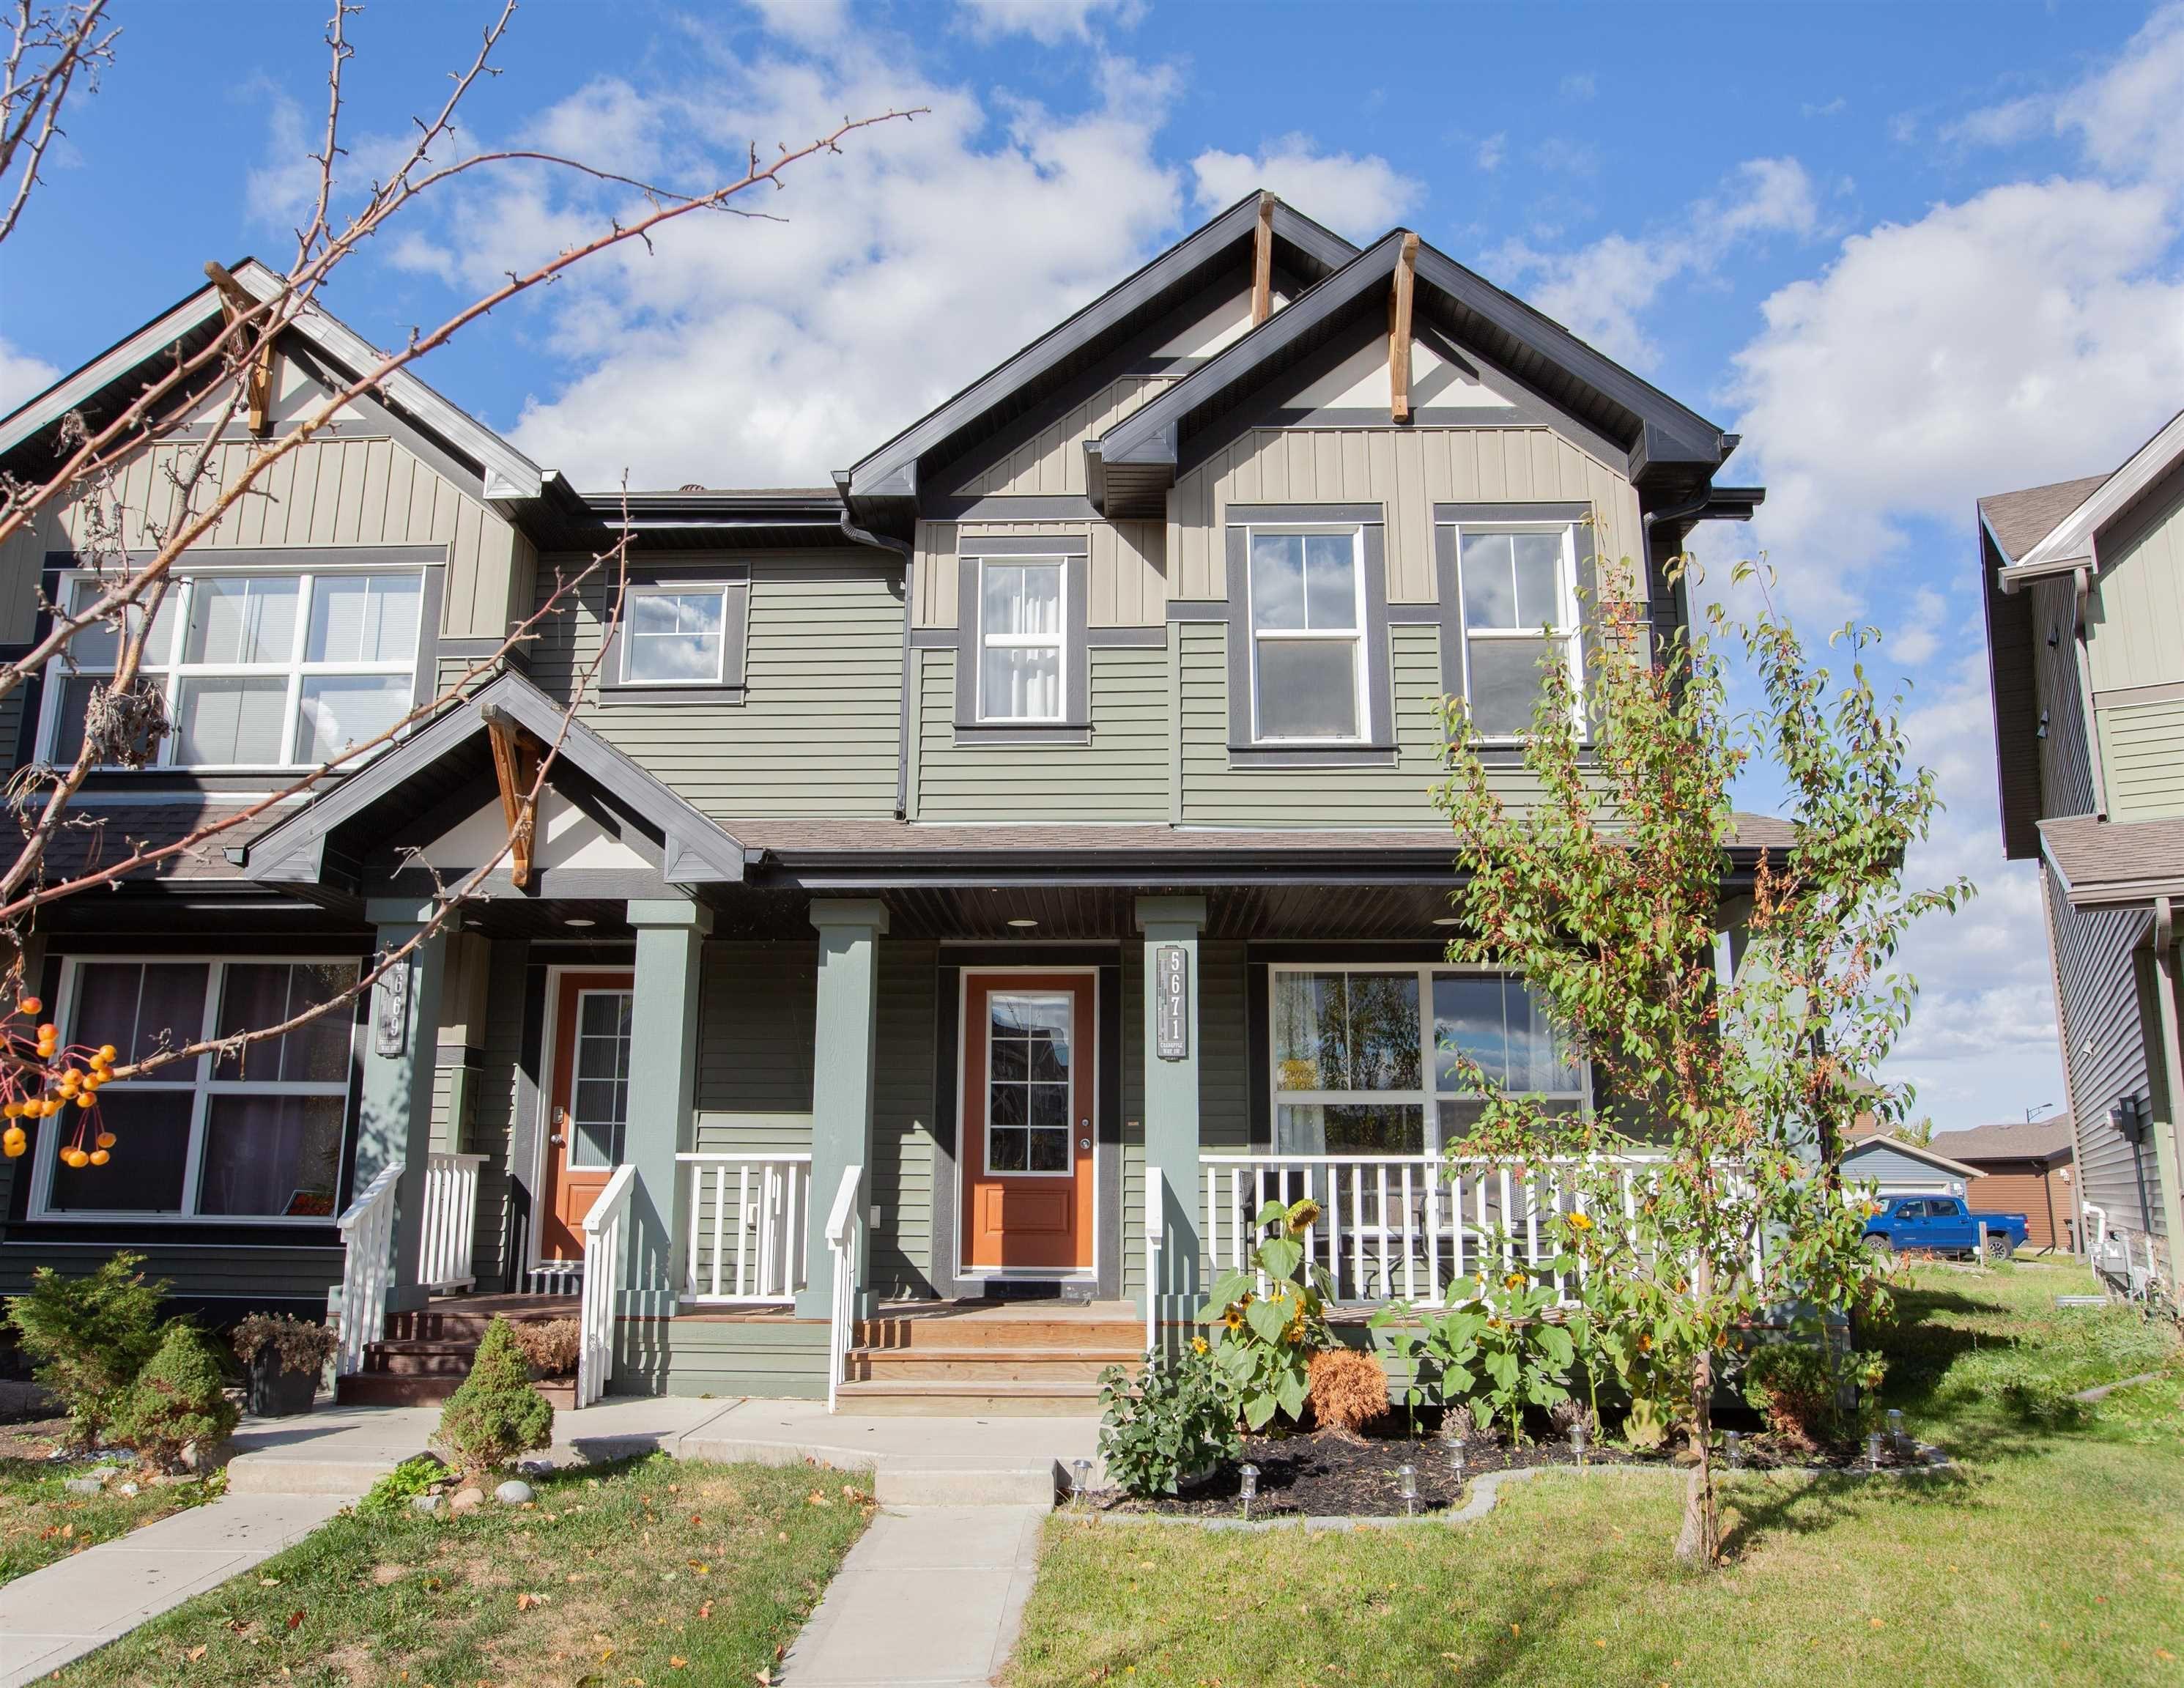 Main Photo: 5671 CRABAPPLE Way SW in Edmonton: Zone 53 House Half Duplex for sale : MLS®# E4263312